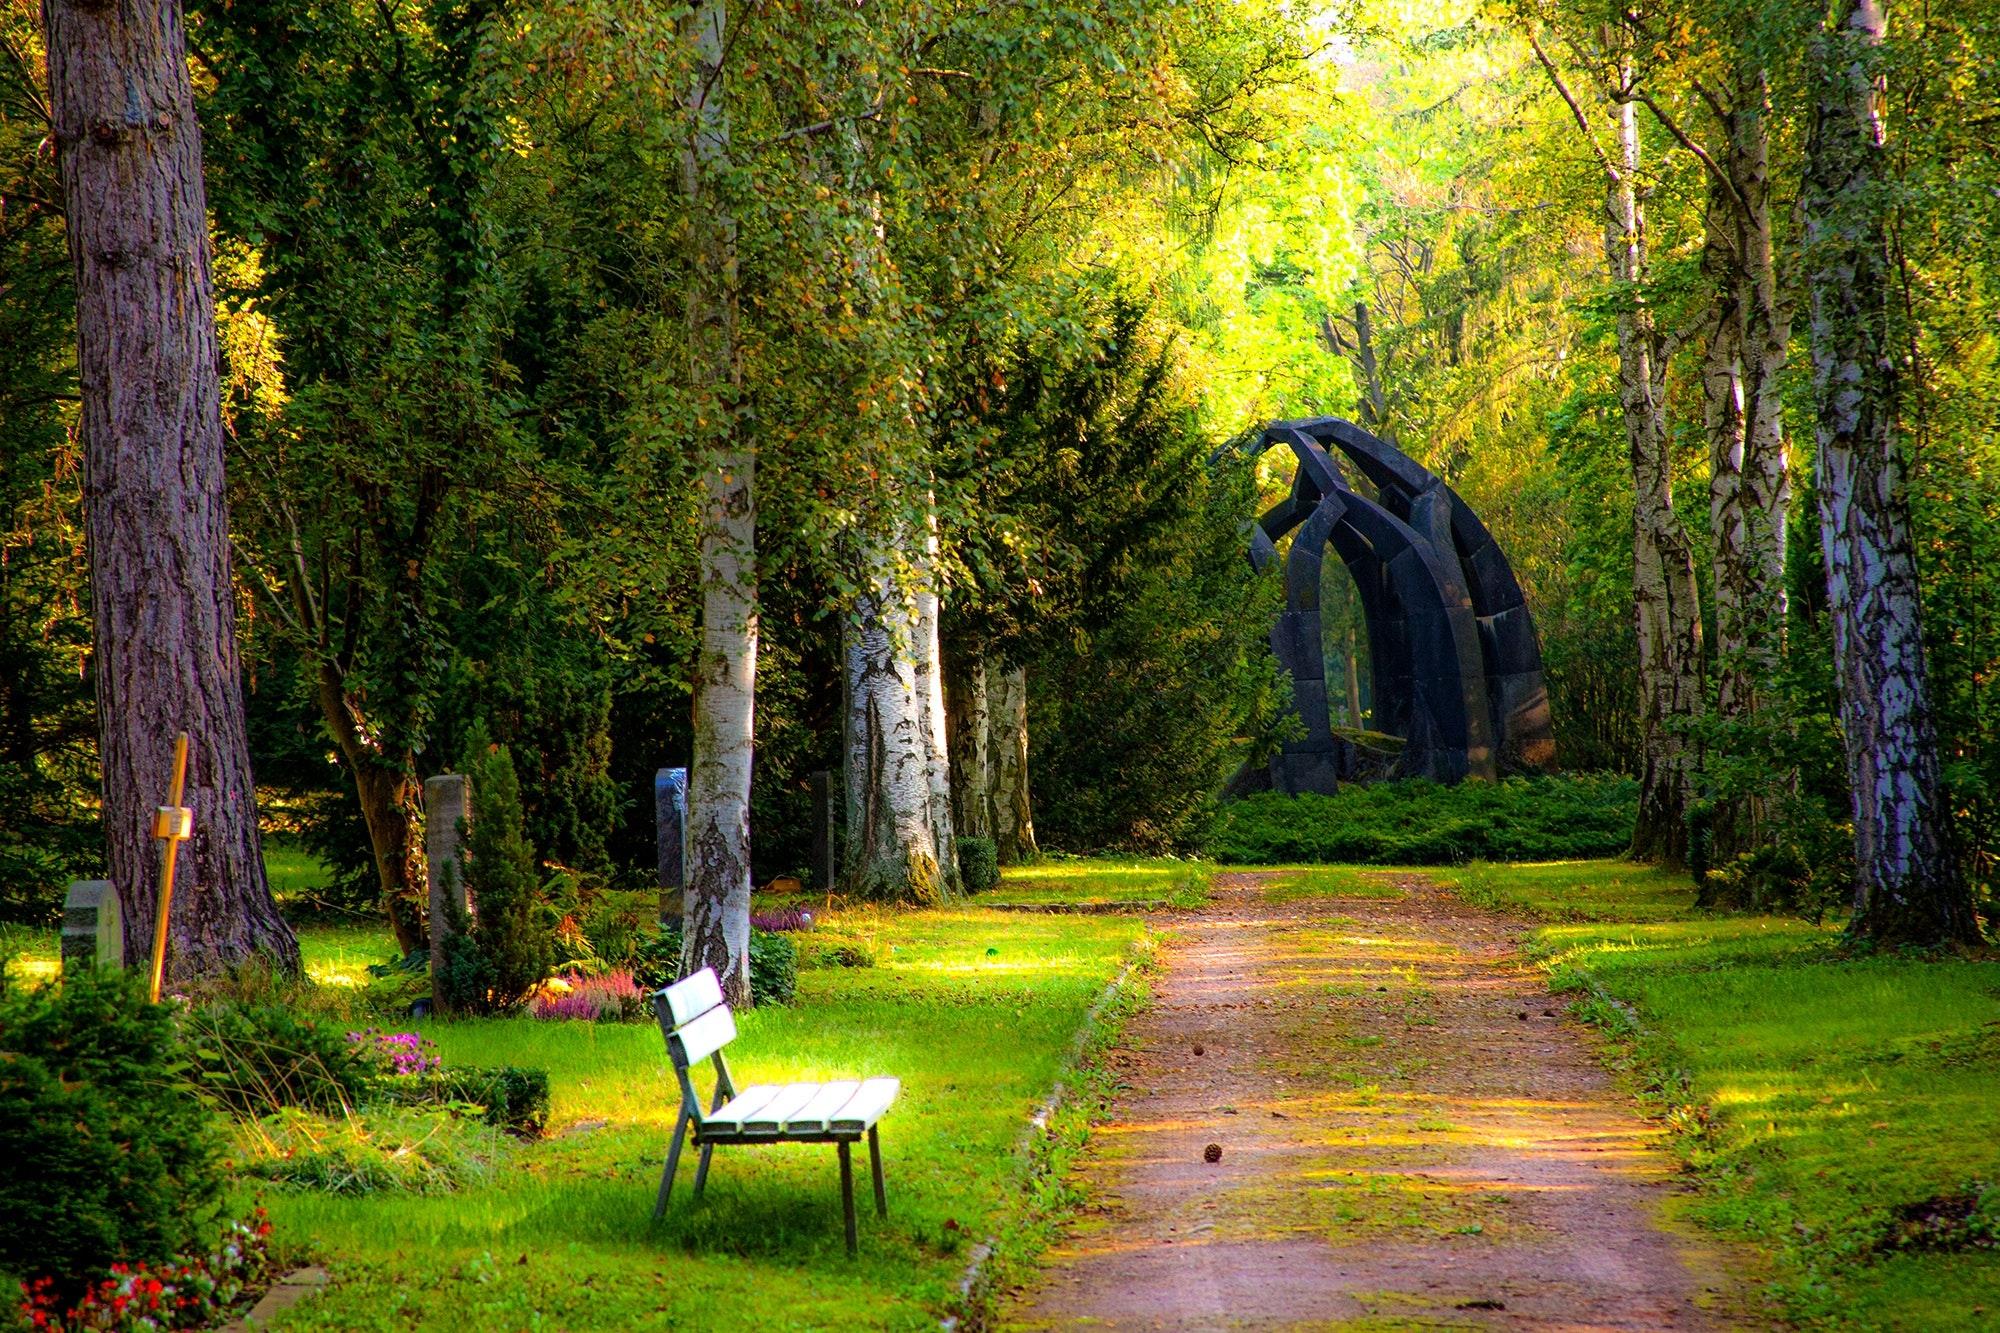 Attirant 1000+ Interesting Garden Photos · Pexels · Free Stock Photos